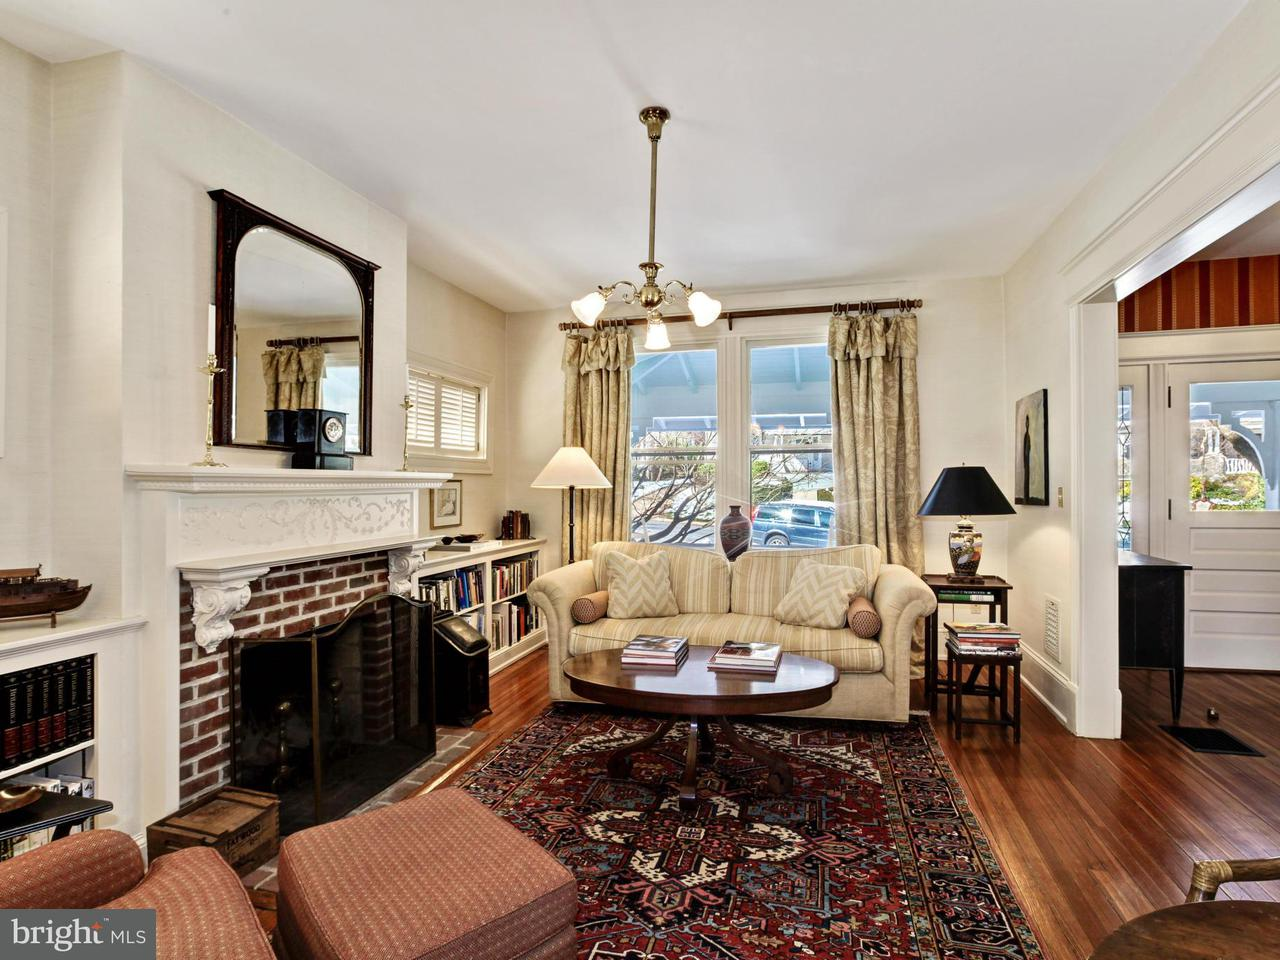 Additional photo for property listing at 2946 NEWARK ST NW 2946 NEWARK ST NW Washington, Distrito De Columbia 20008 Estados Unidos